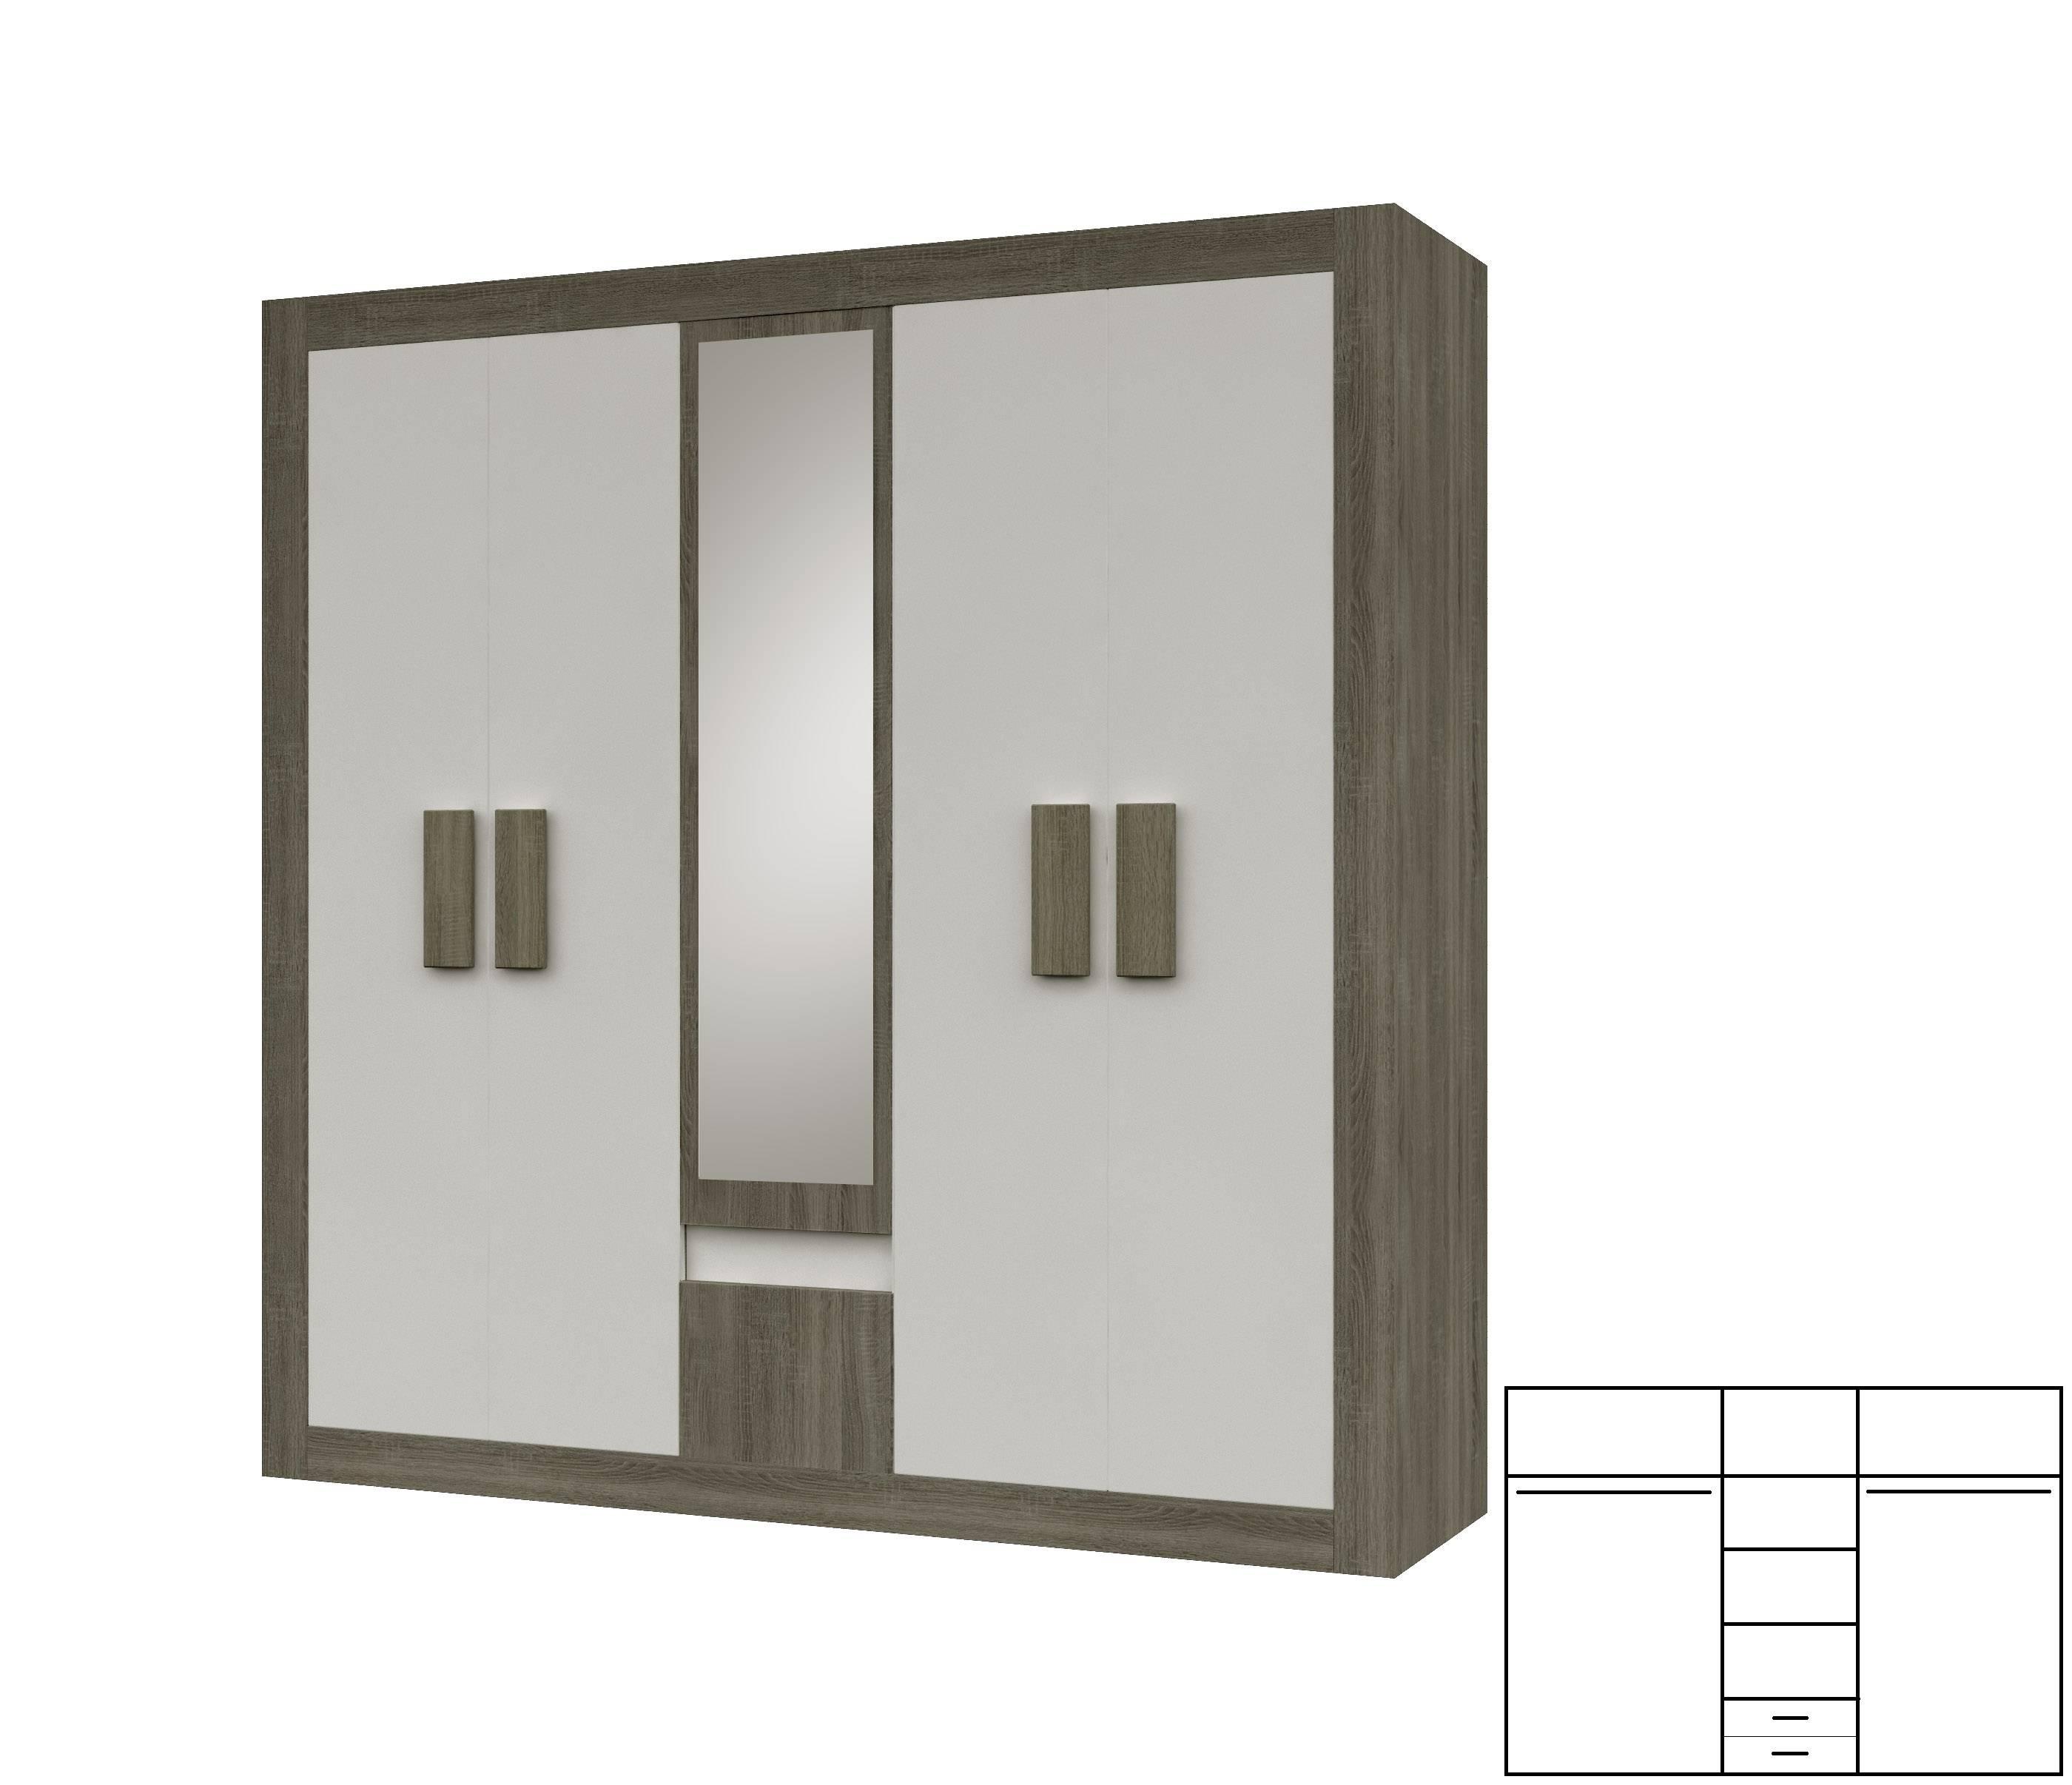 Modern 5 Door Wardrobe Mirror 2 Hanging Rails 2 Drawers 6 Shelves Intended For 5 Door Wardrobes (View 13 of 15)